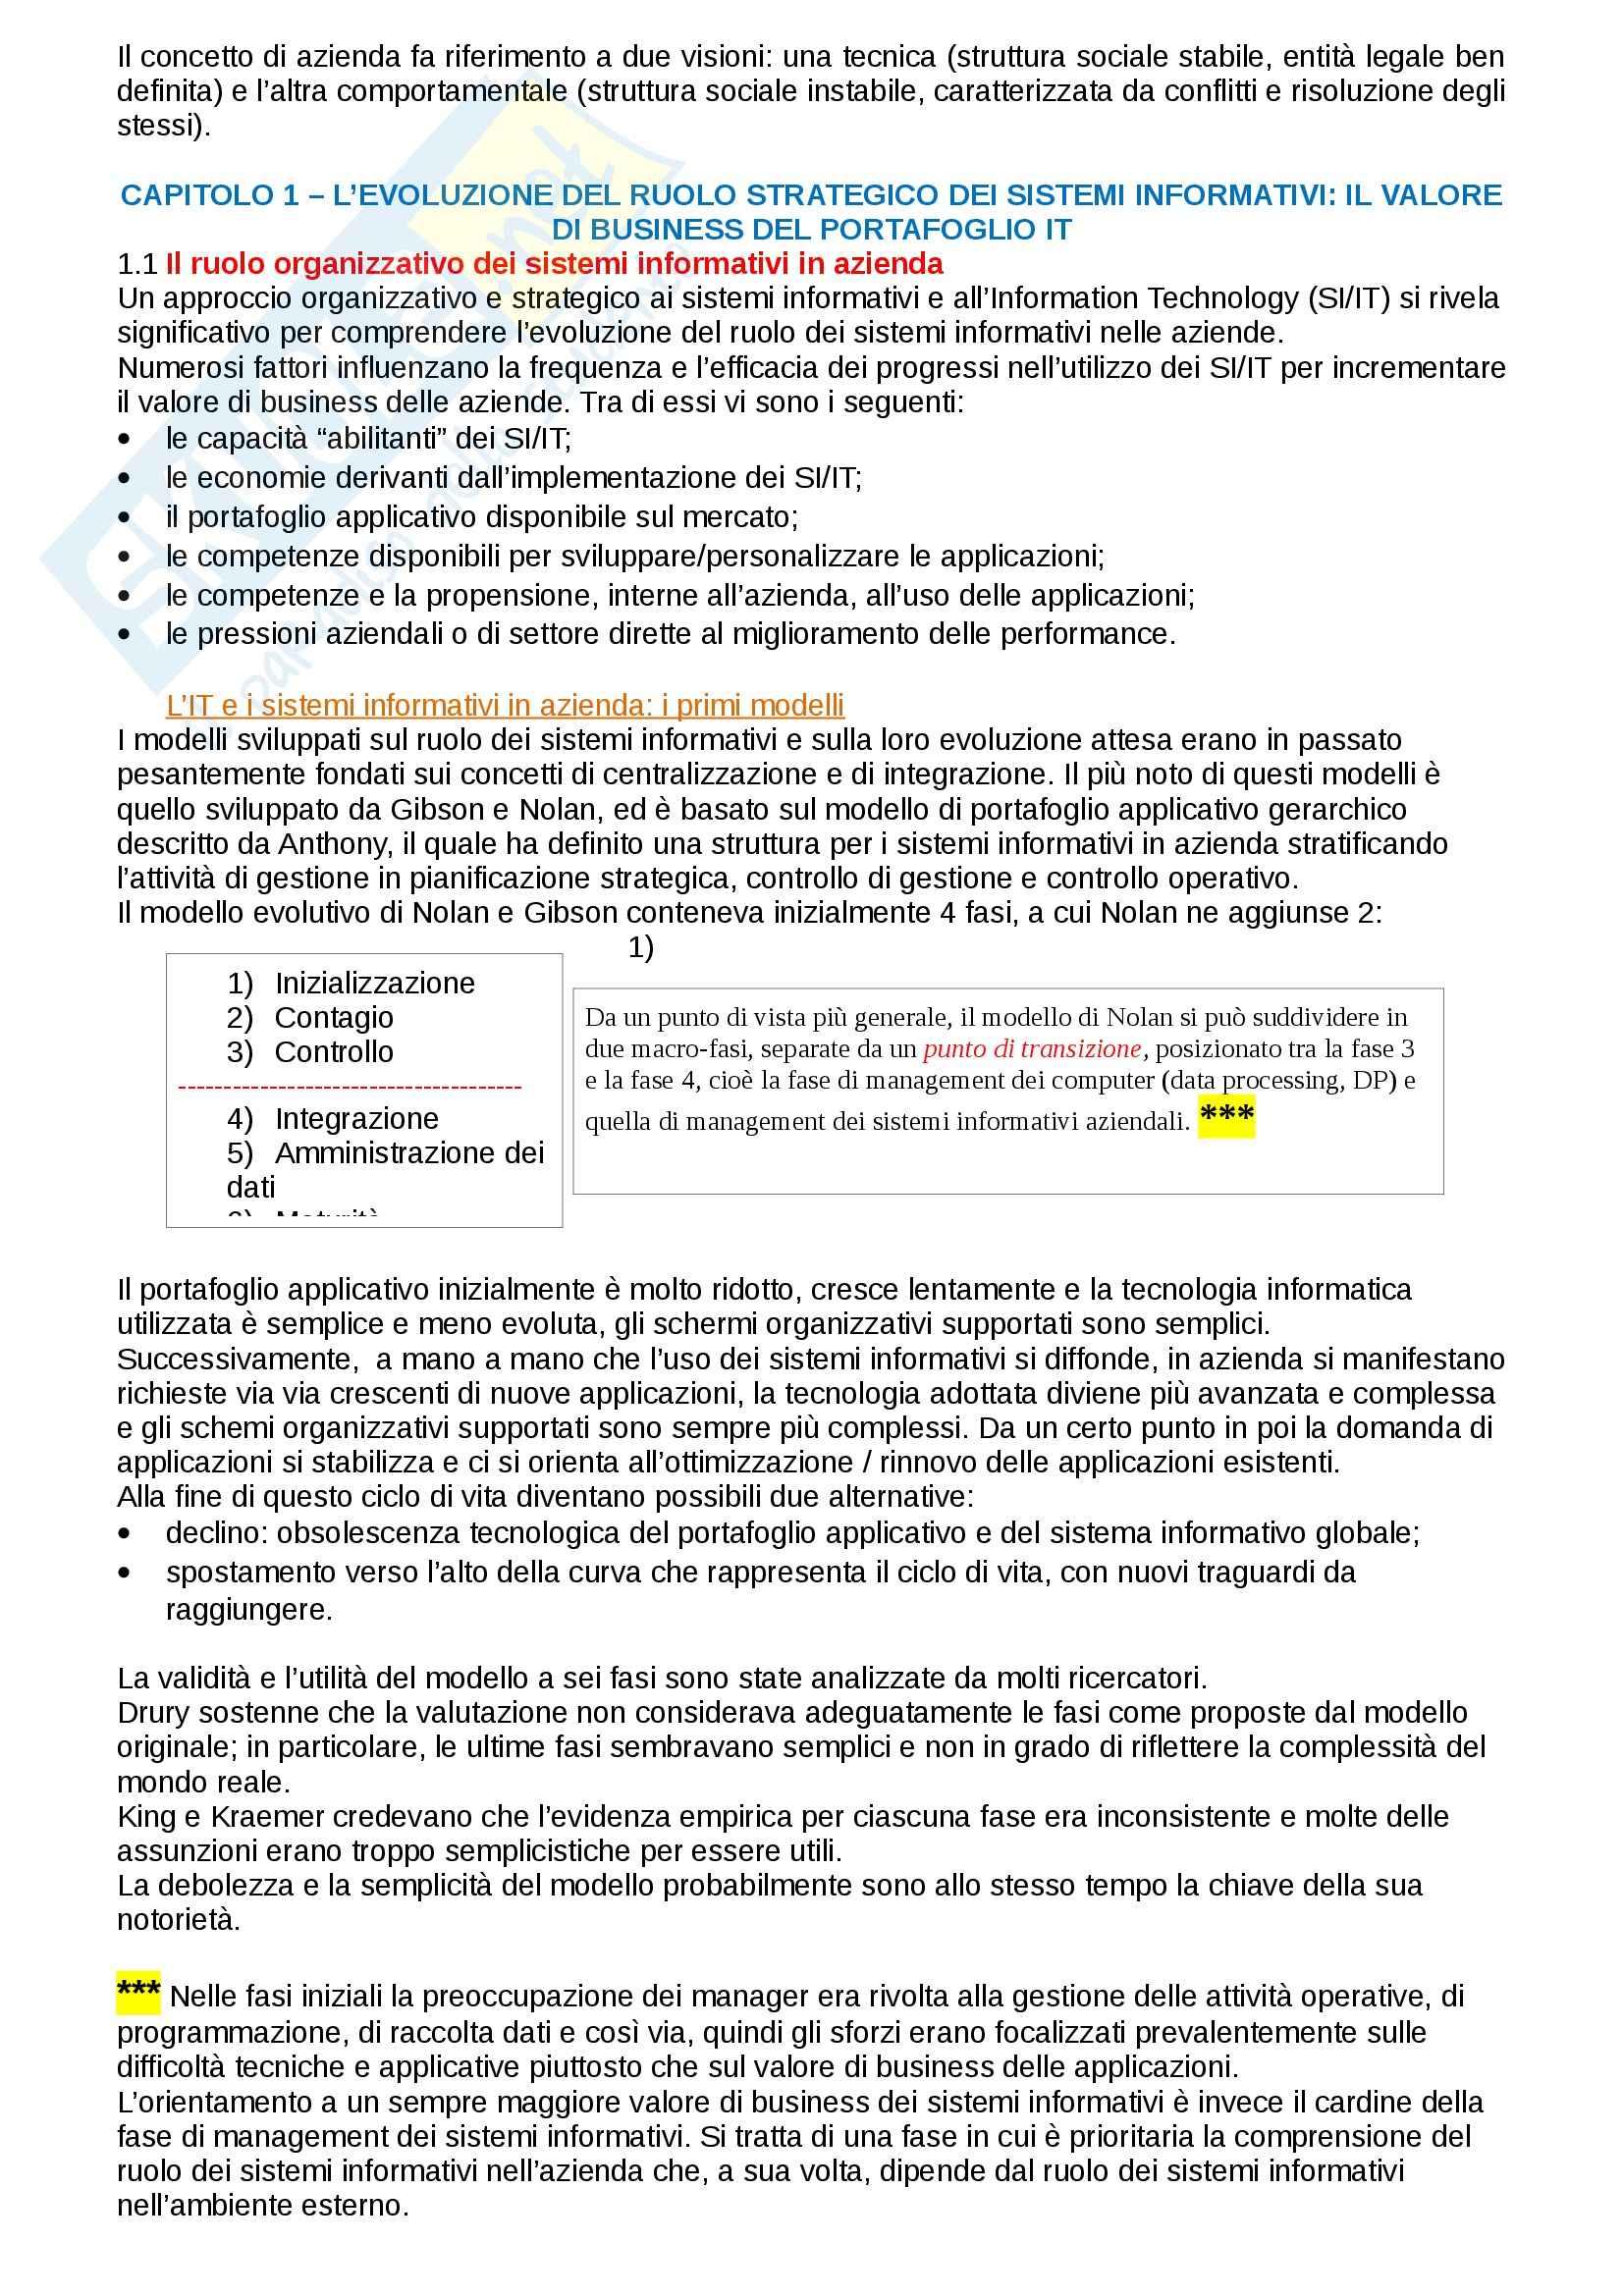 Riassunto esame Management dei sistemi informativi, prof. Morabito, libro consigliato Management dei sistemi informativi, Laudon Pag. 2